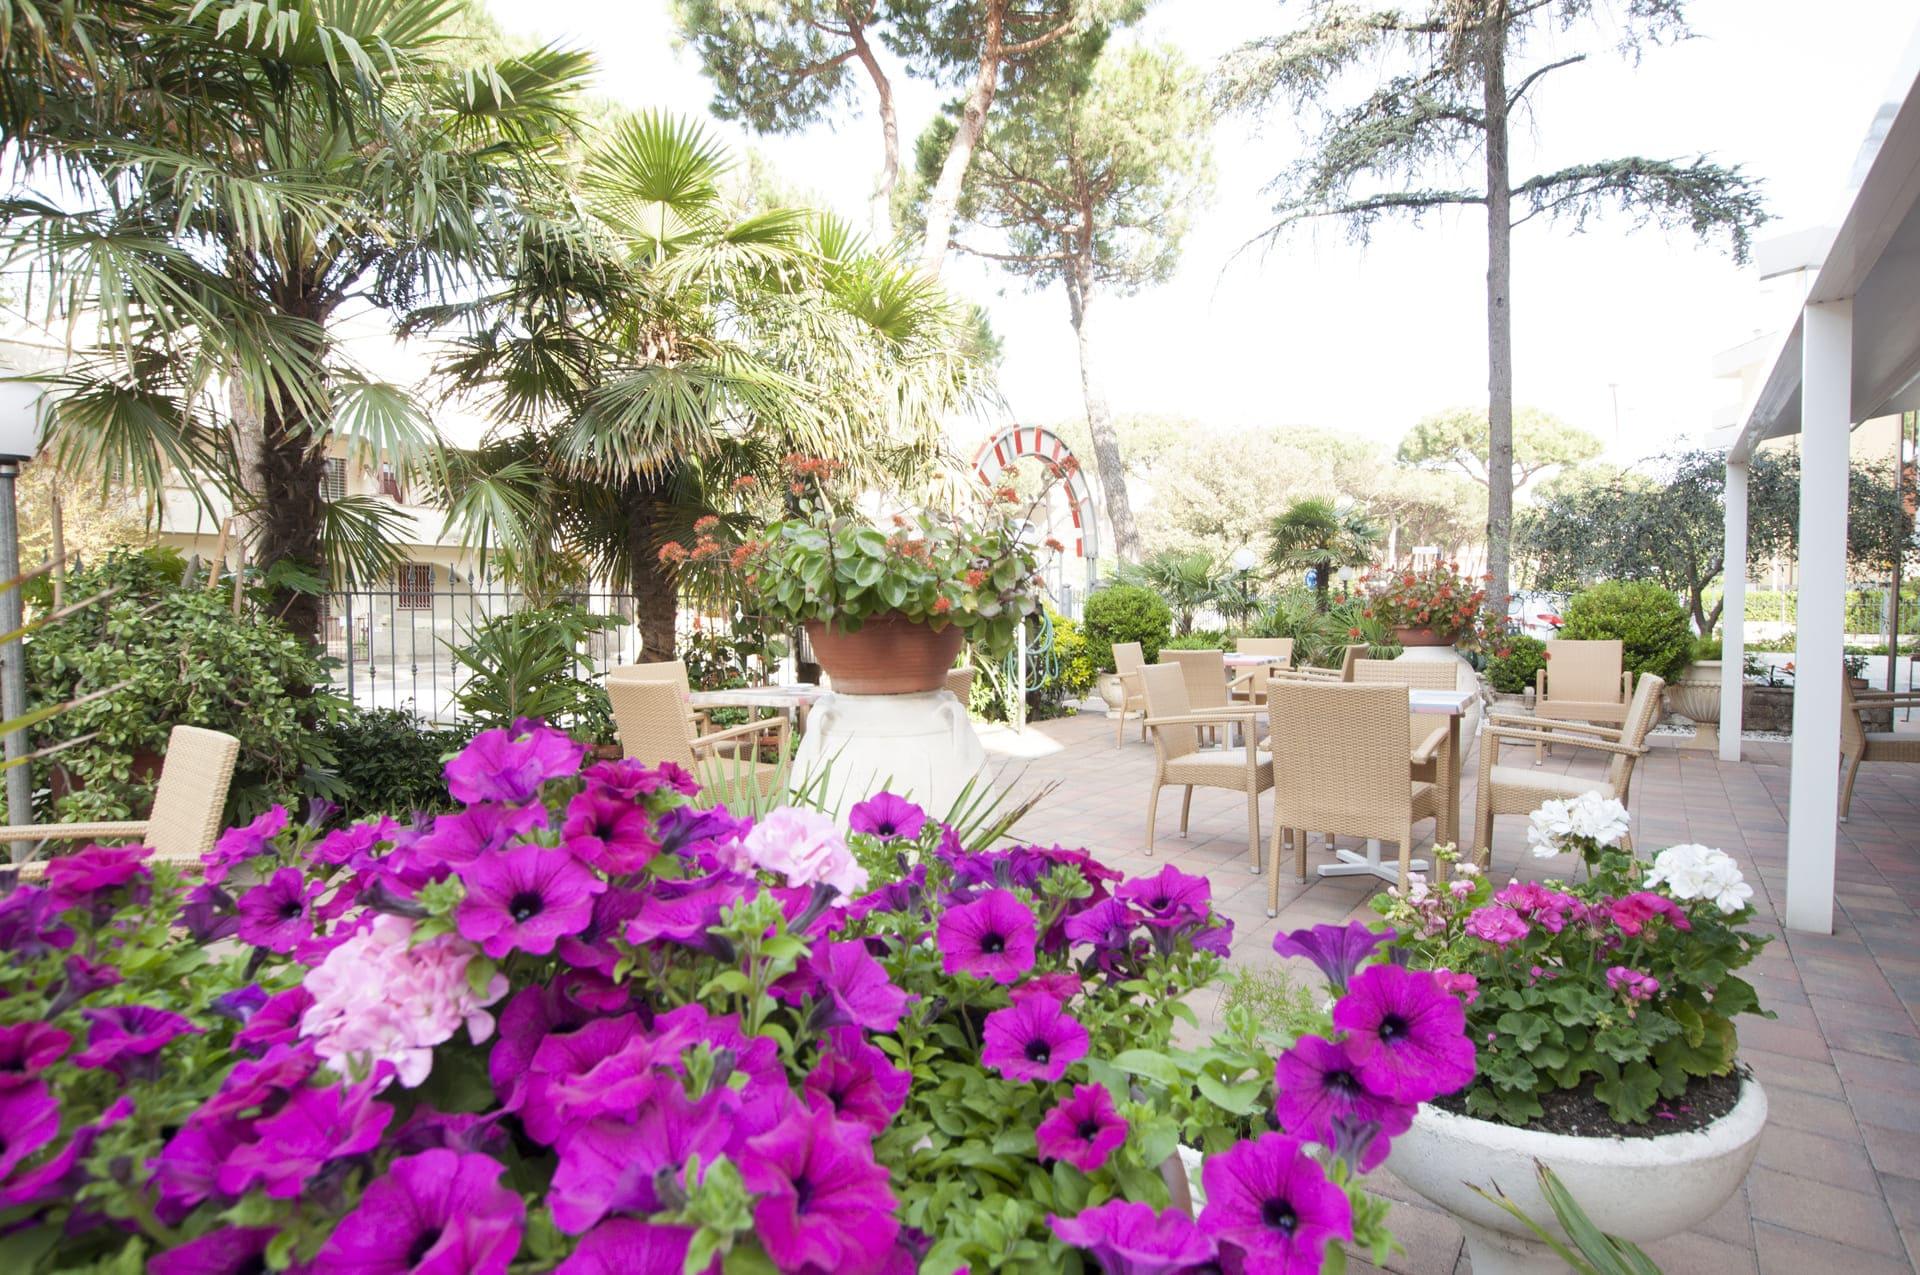 Hotel B&B Edelweiss Pinarella di Cervia